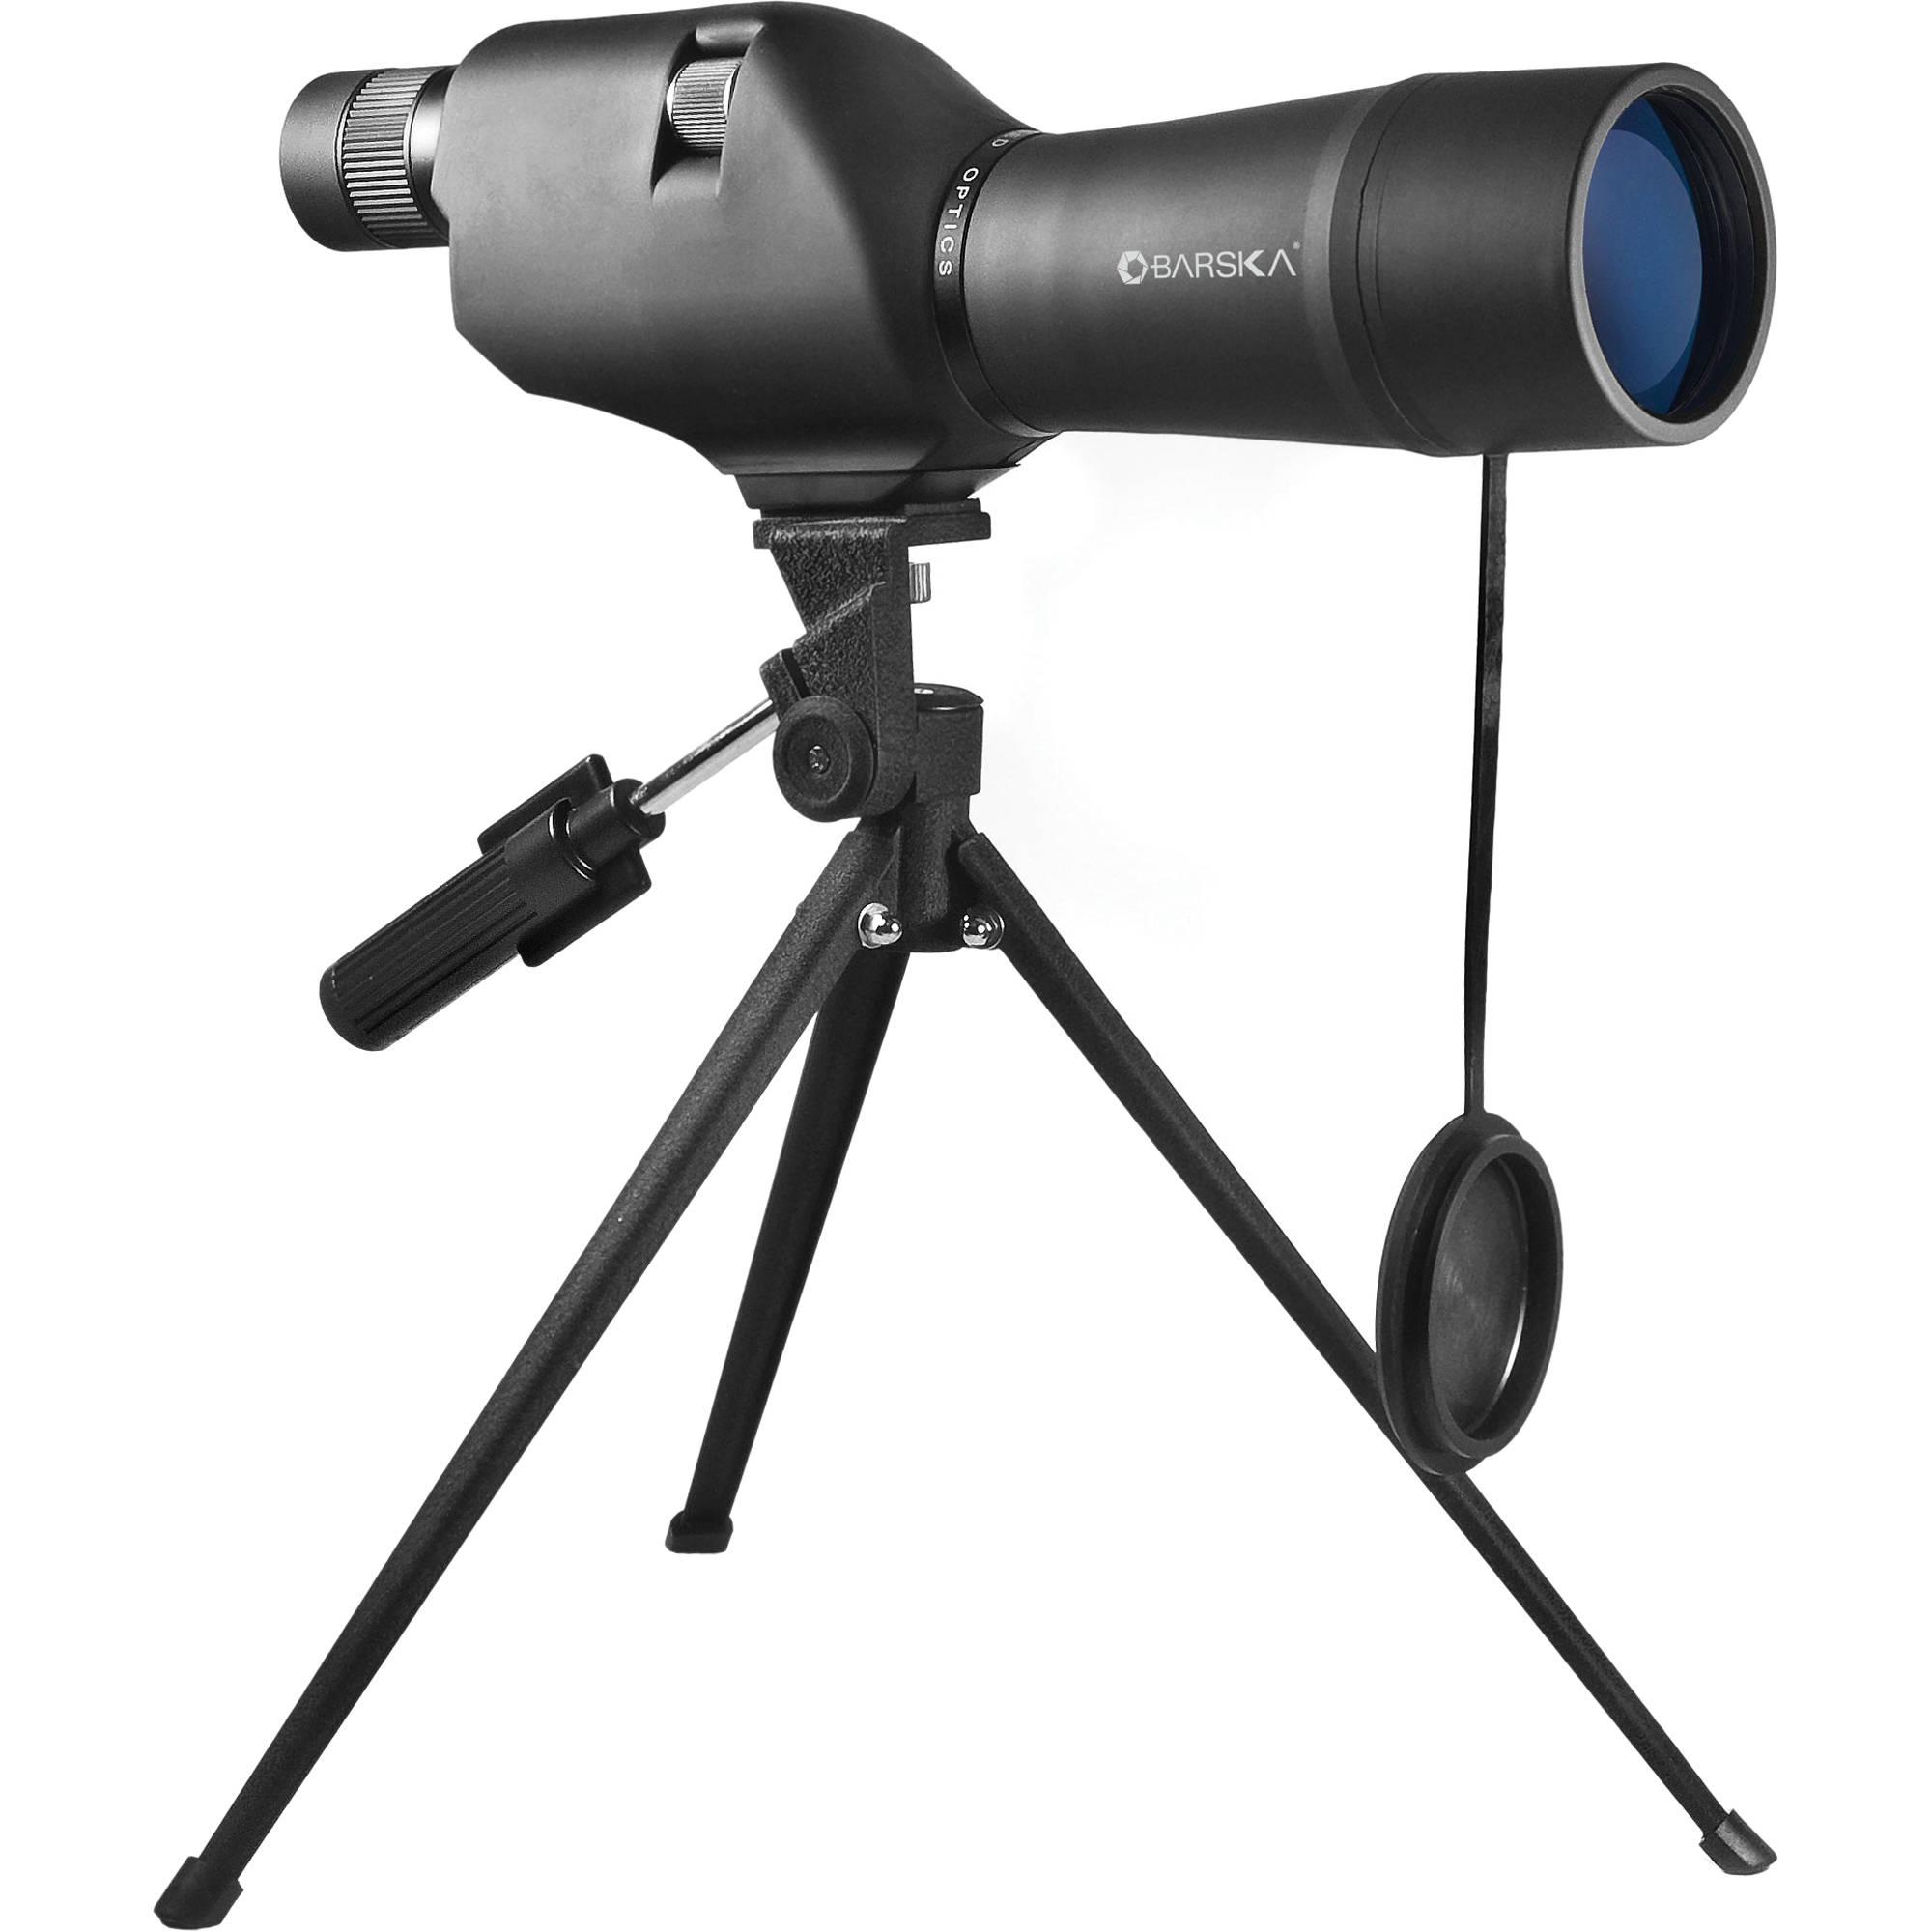 Barska 20-60x60 WP Colorado Spotting Scope (Straight Viewing)